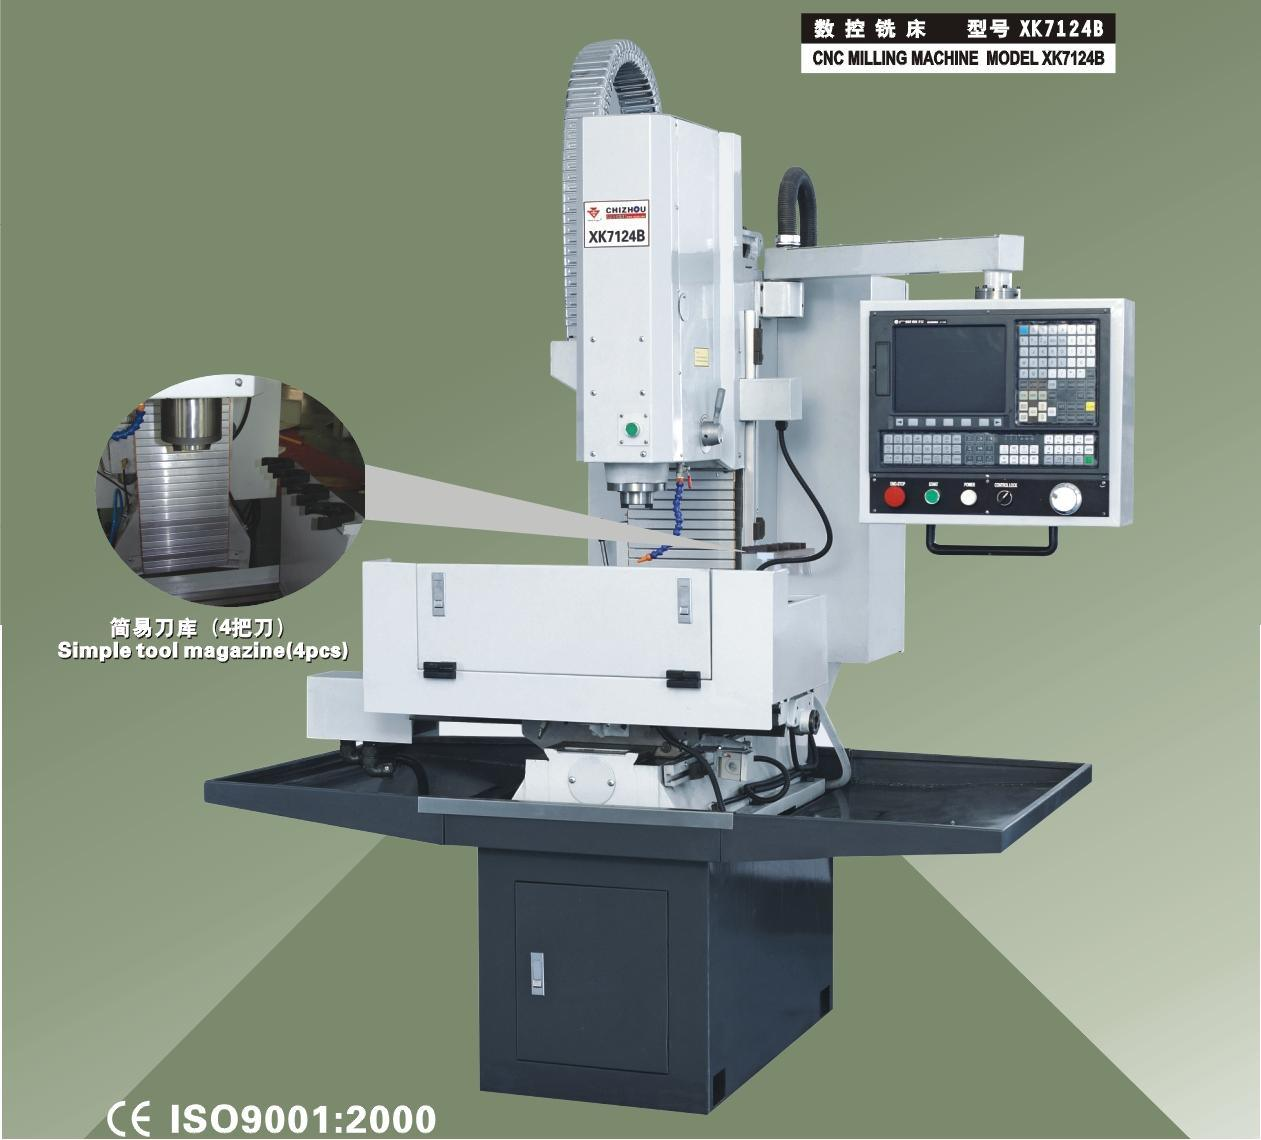 CNC Milling Machine (XK7124B)